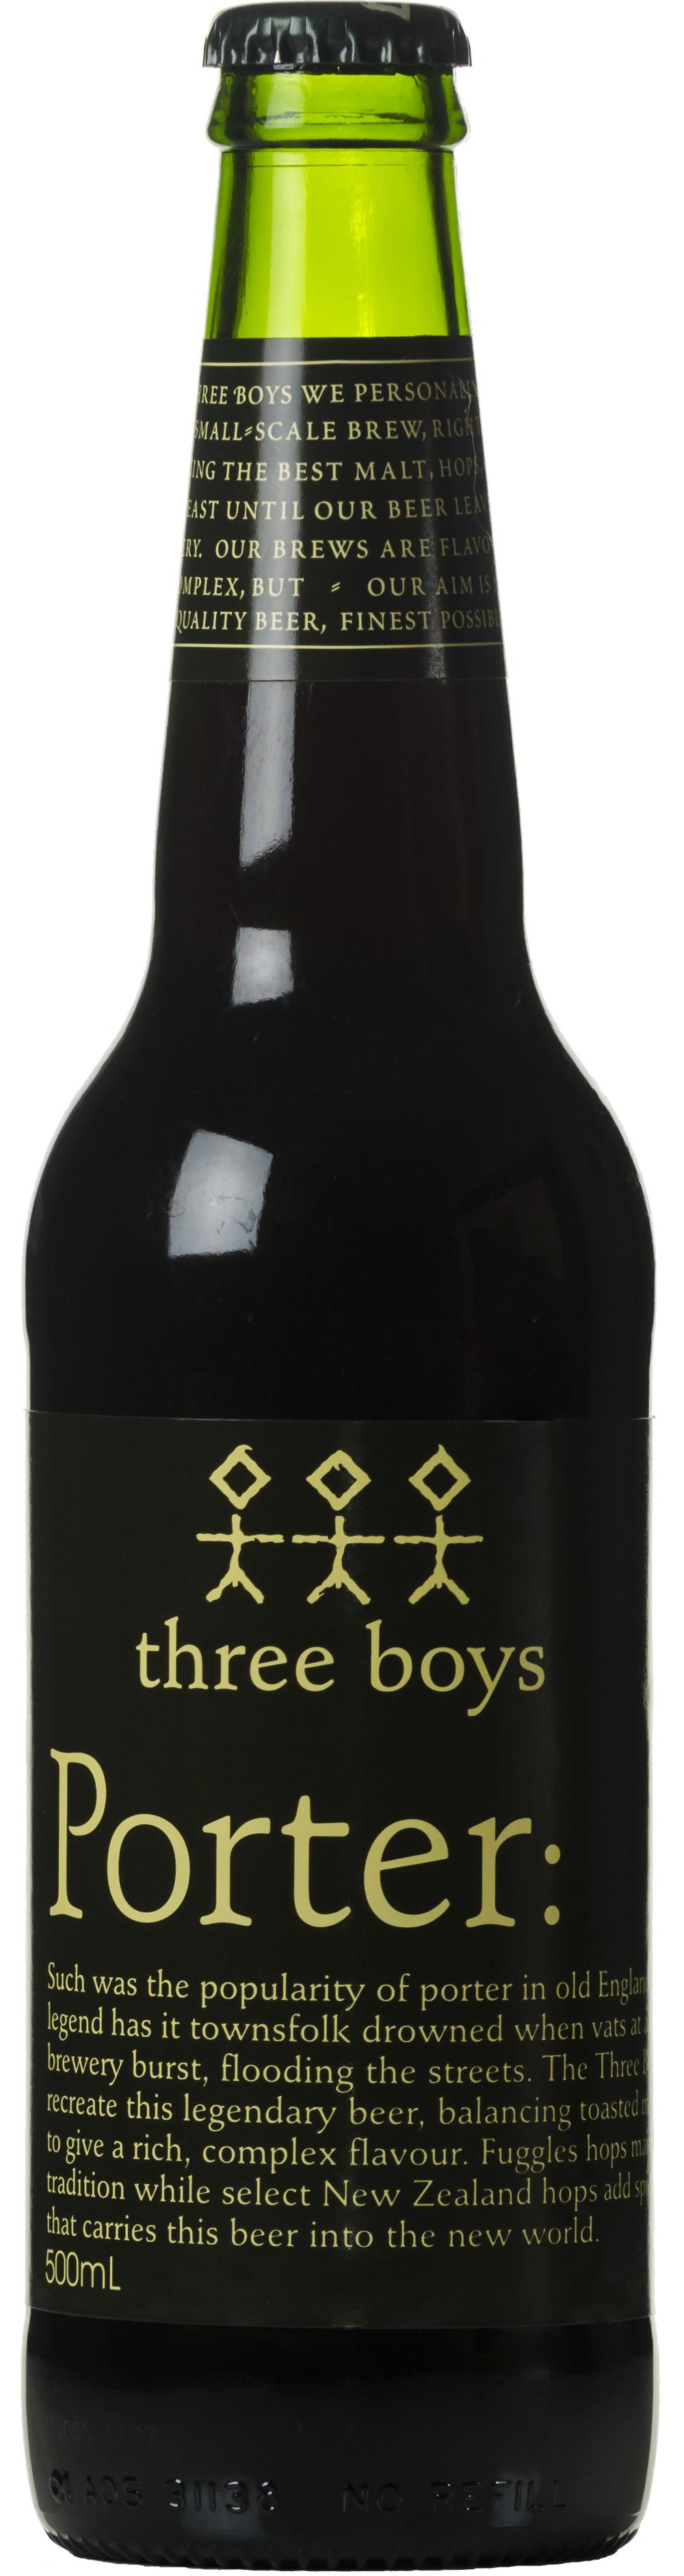 Porter bottle JPG - no shadow.jpg